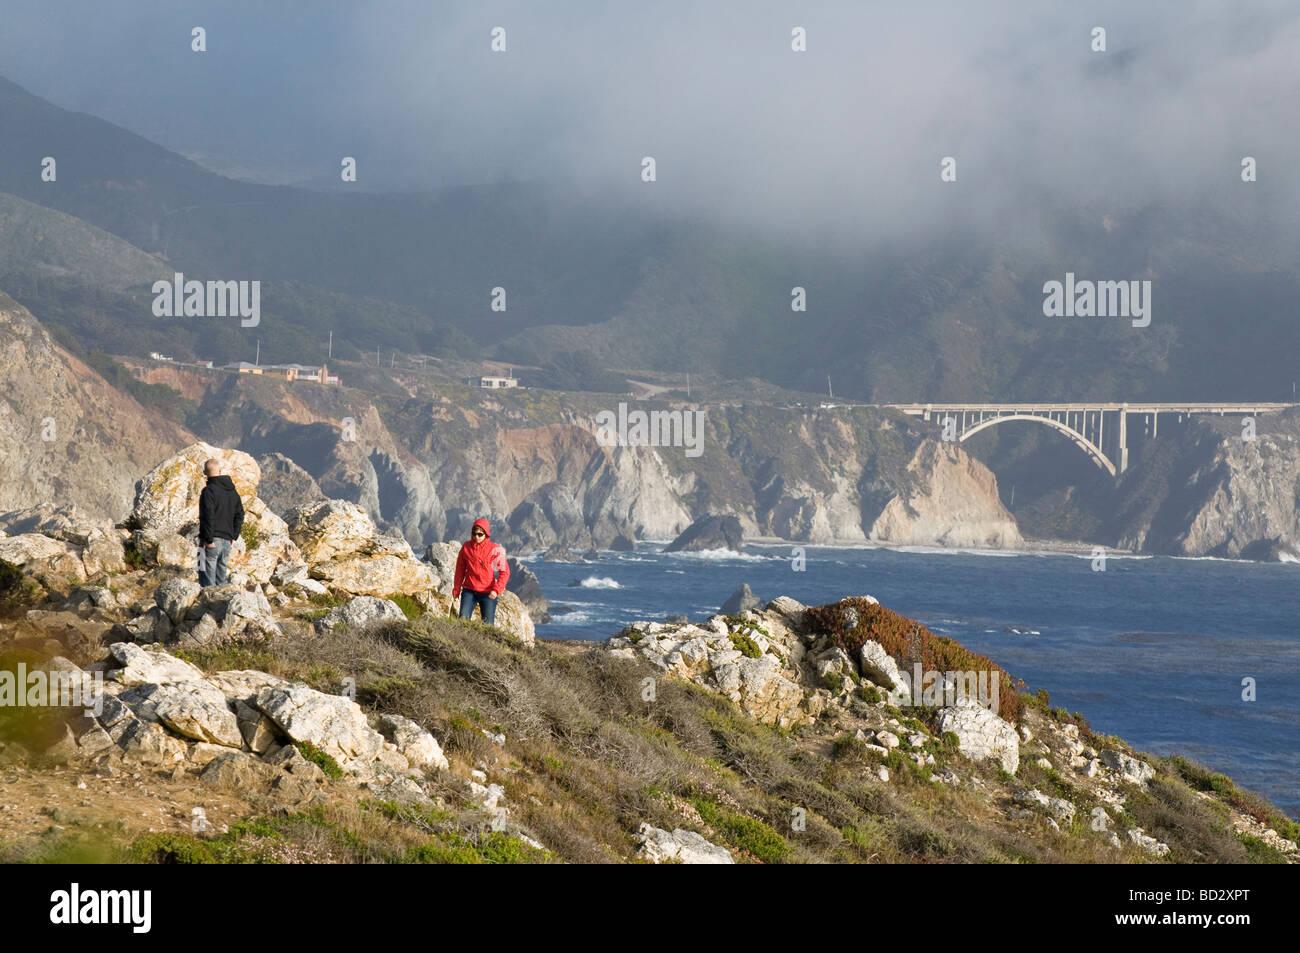 tourist hiking along the rocky coastal cliffs of Big Sur California - Stock Image